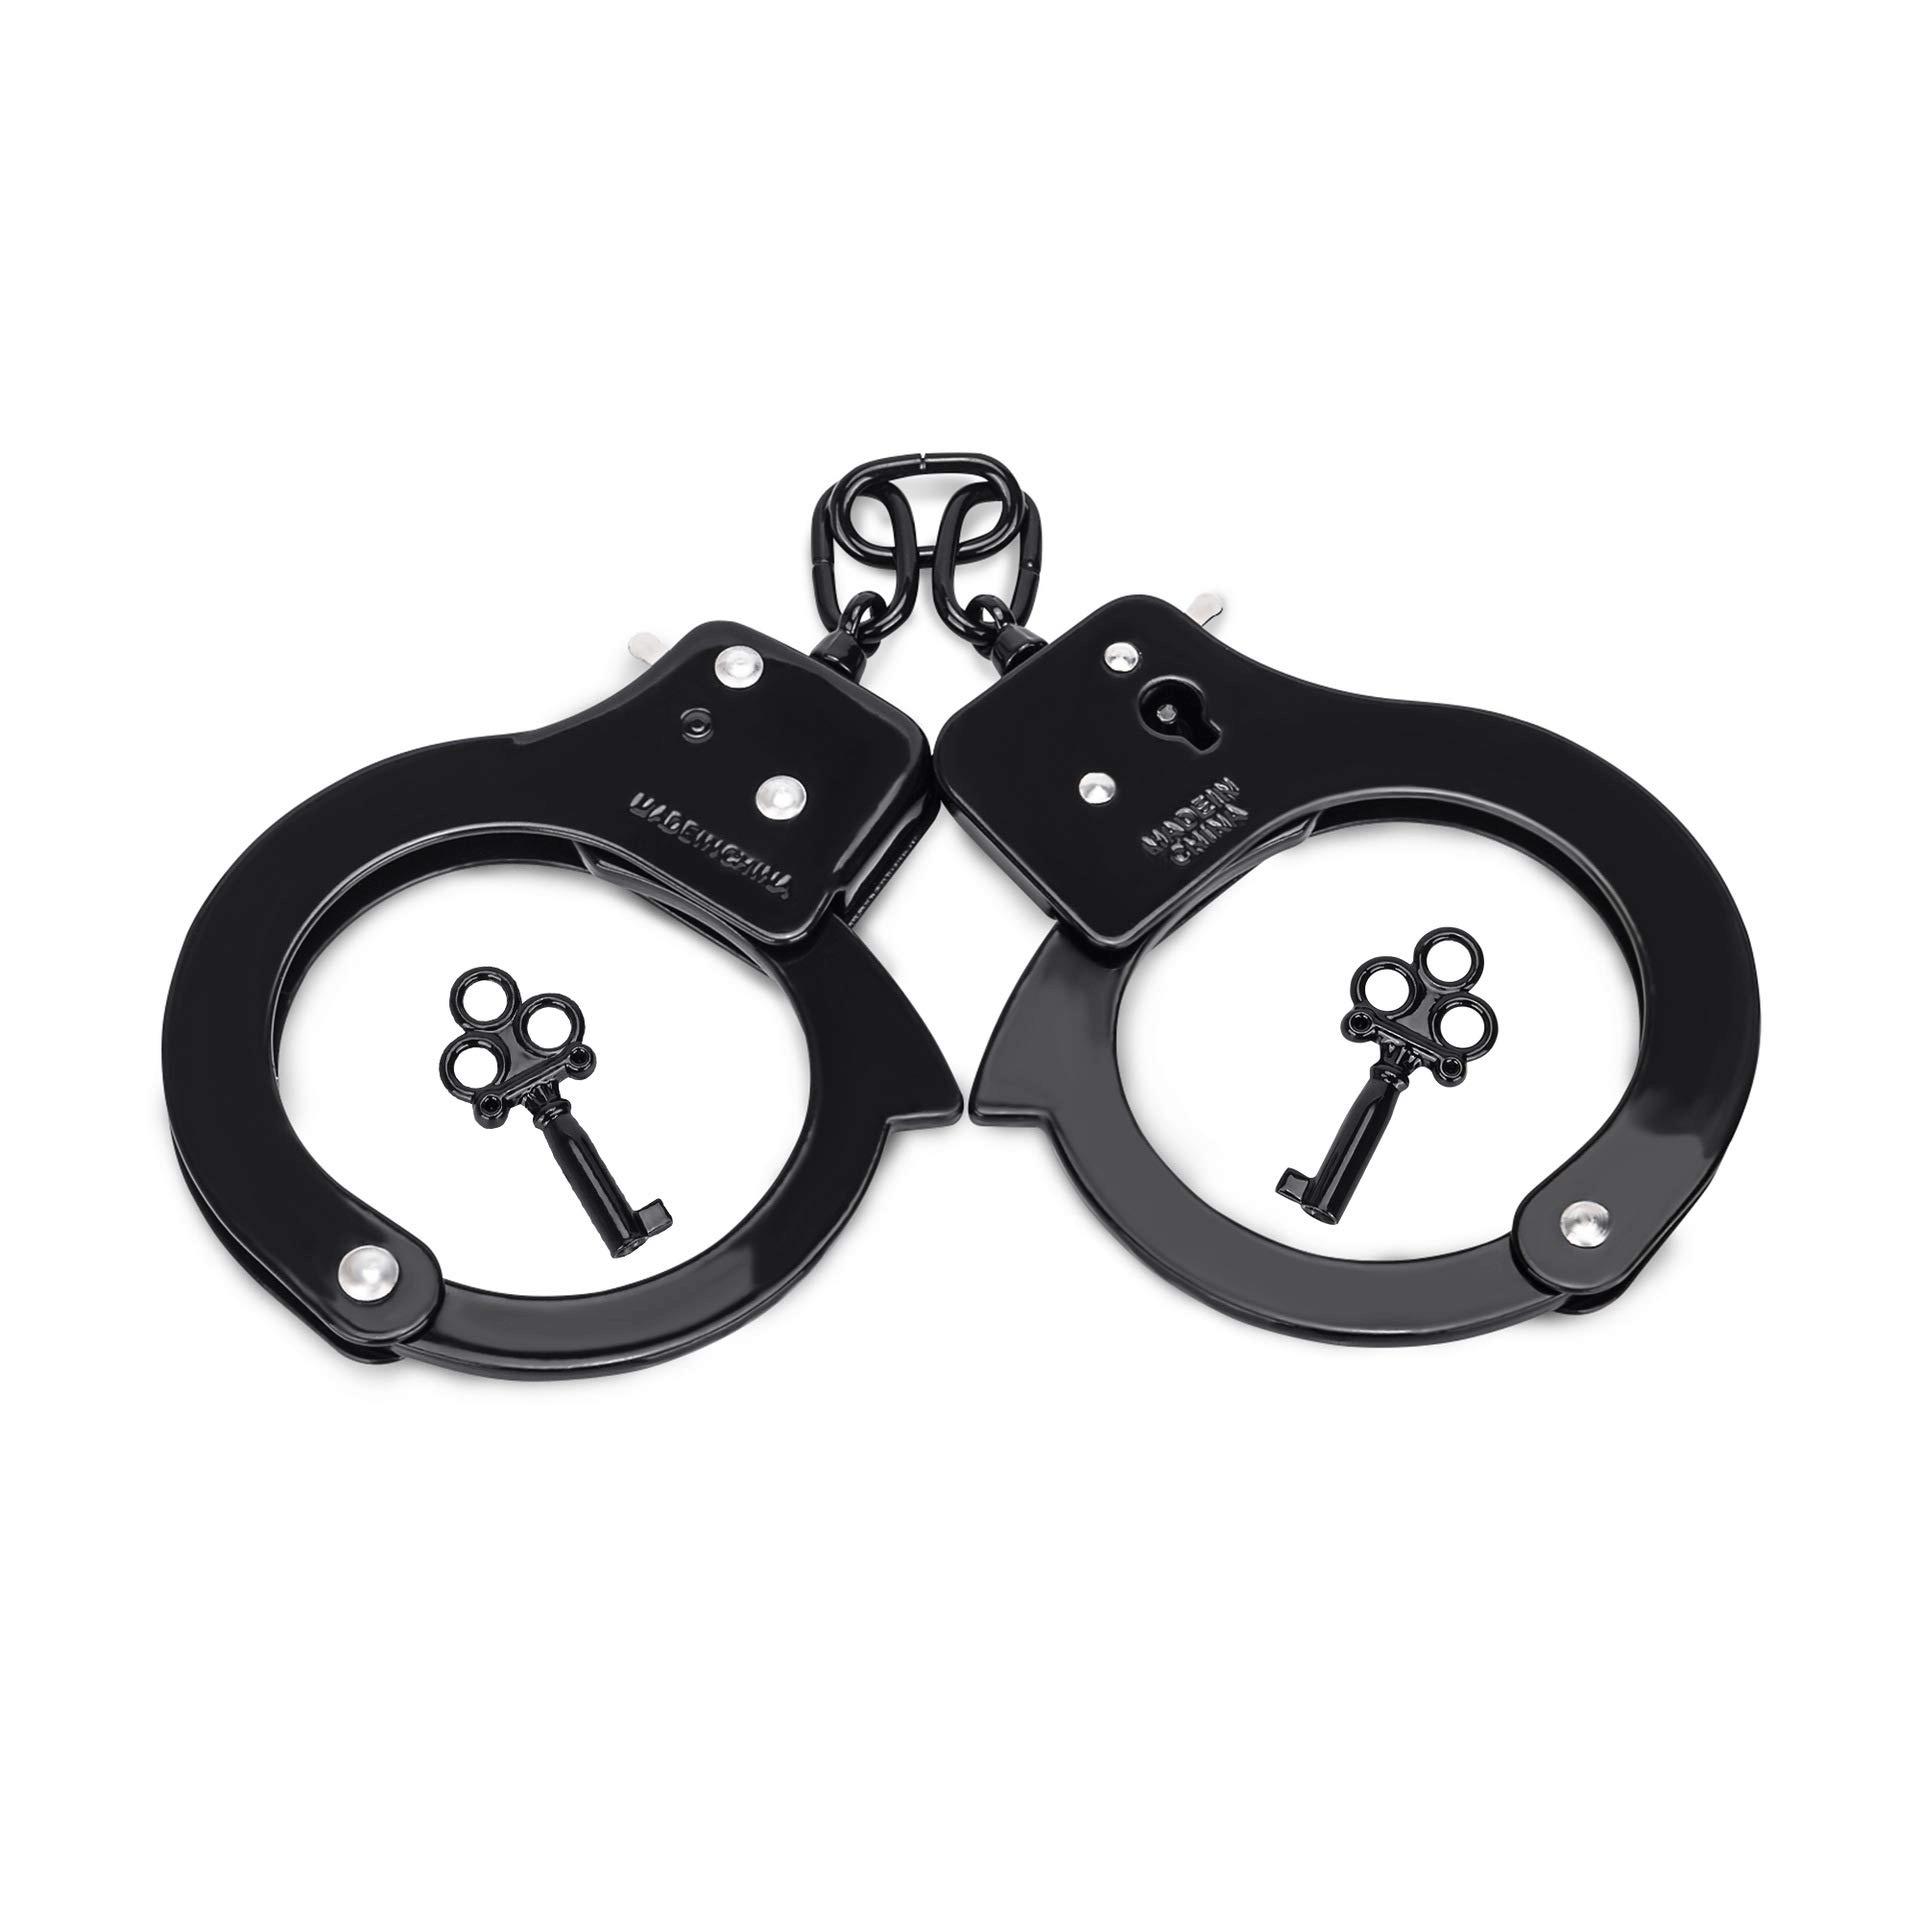 Hitinight Metal Handcuffs With Key Handcuffs